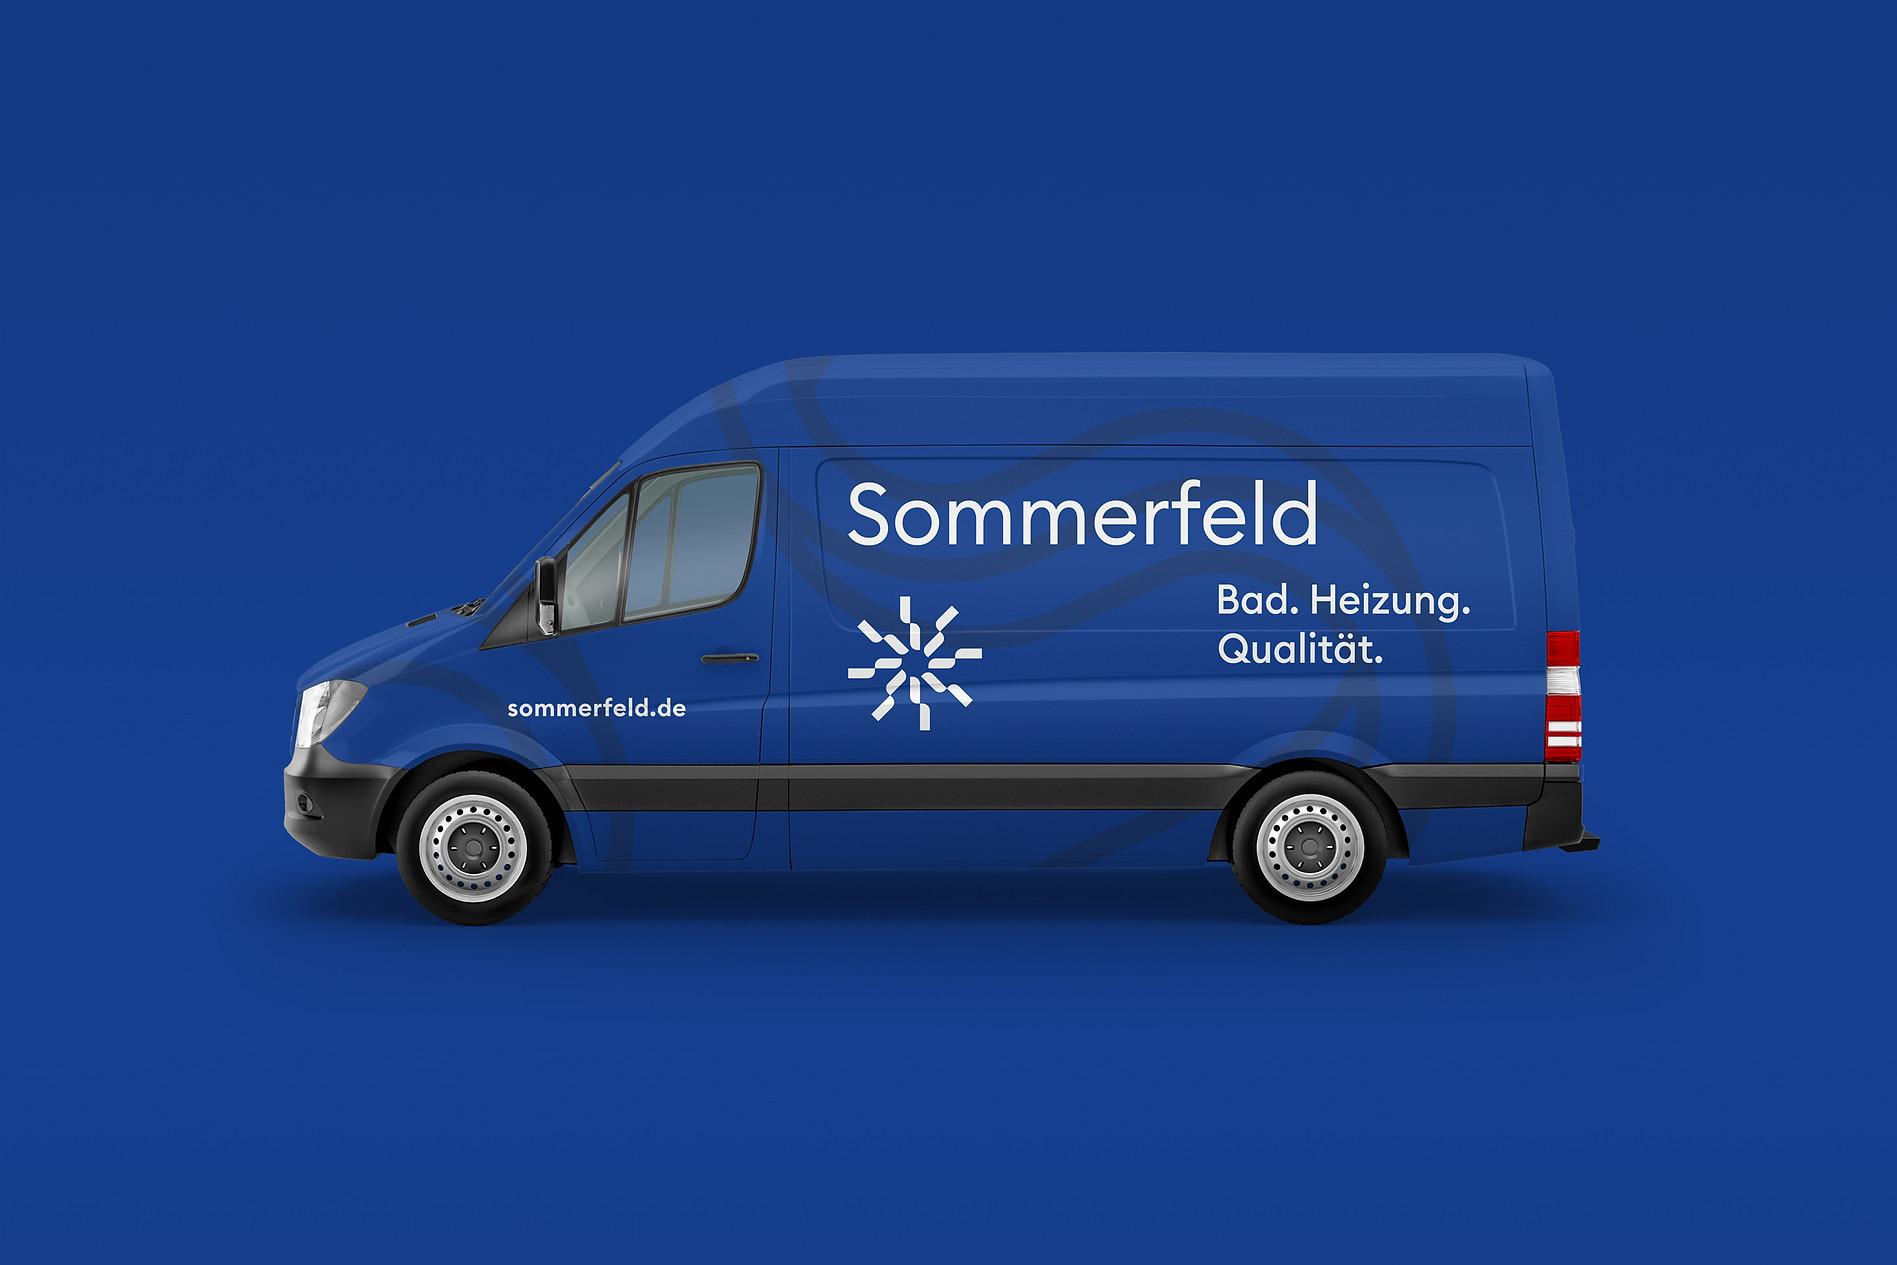 sl_Sommerfeld_23.jpg